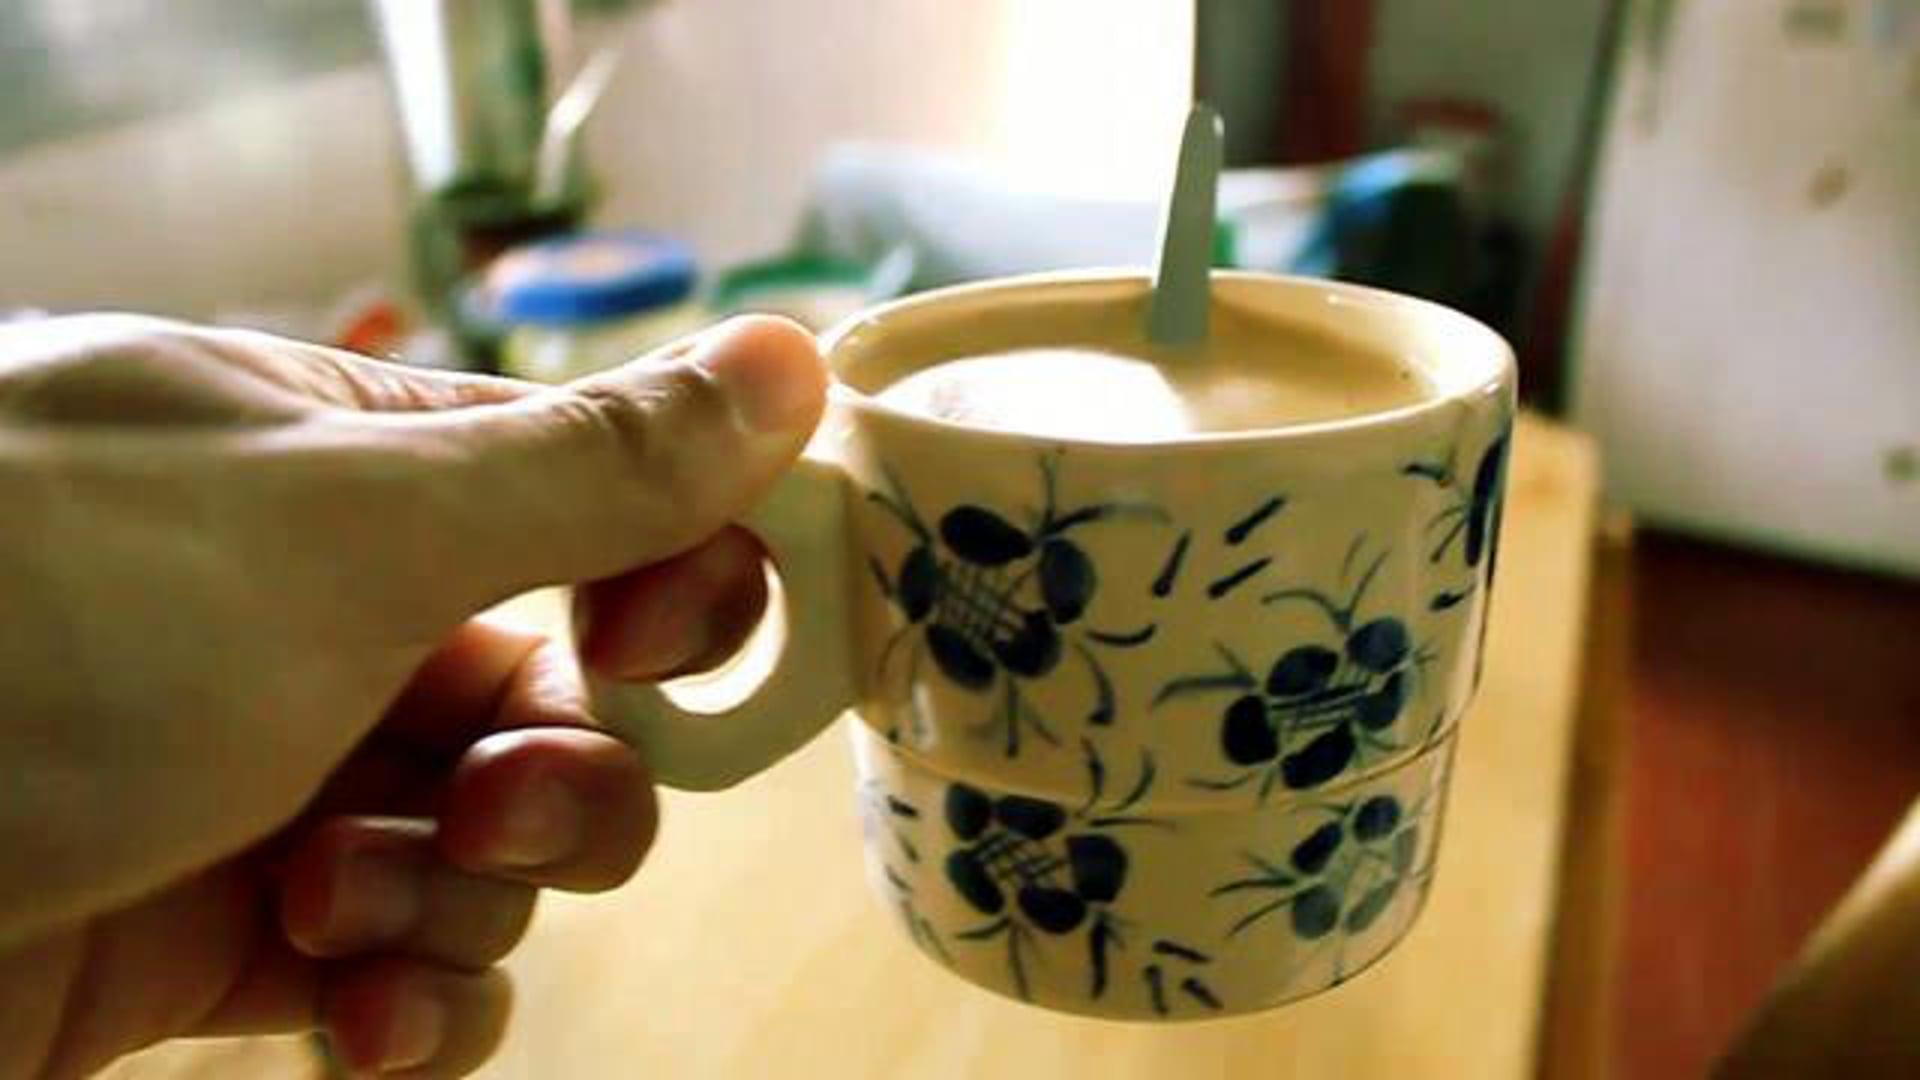 Cómo preparar un café con leche batido // How to make a coffee milk shake